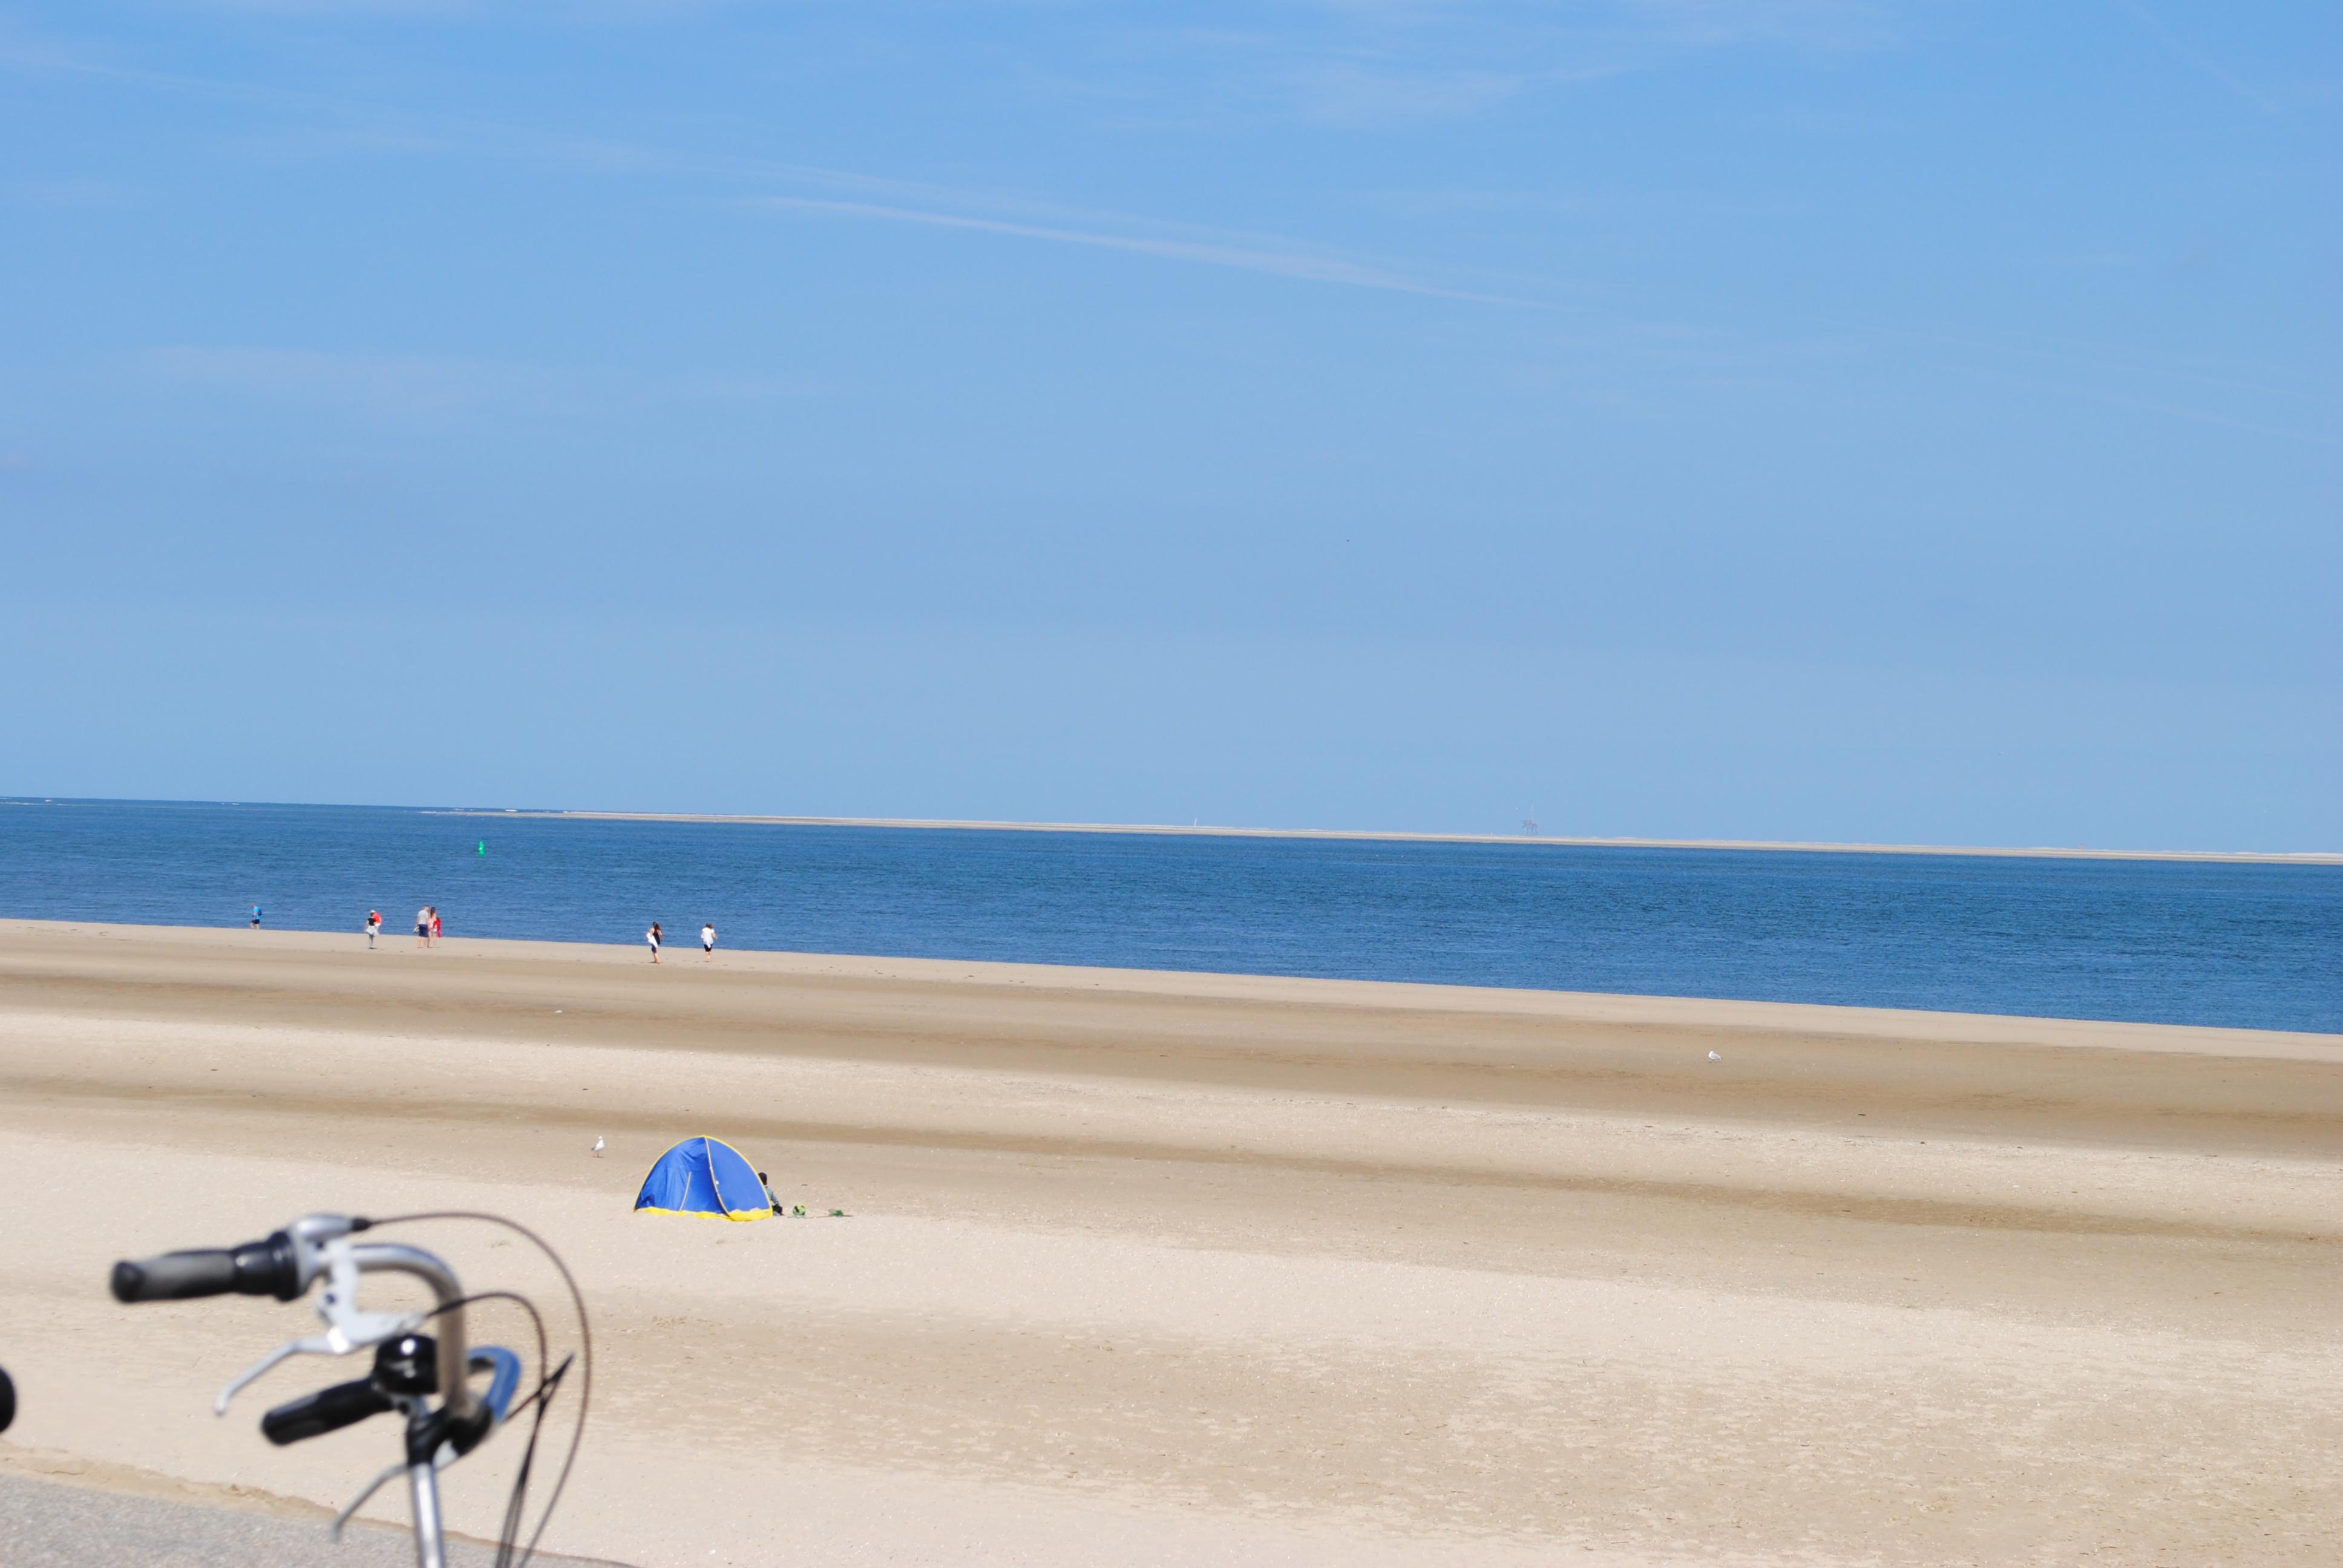 Strak blauwe lucht, en prachtige blauwe zee...